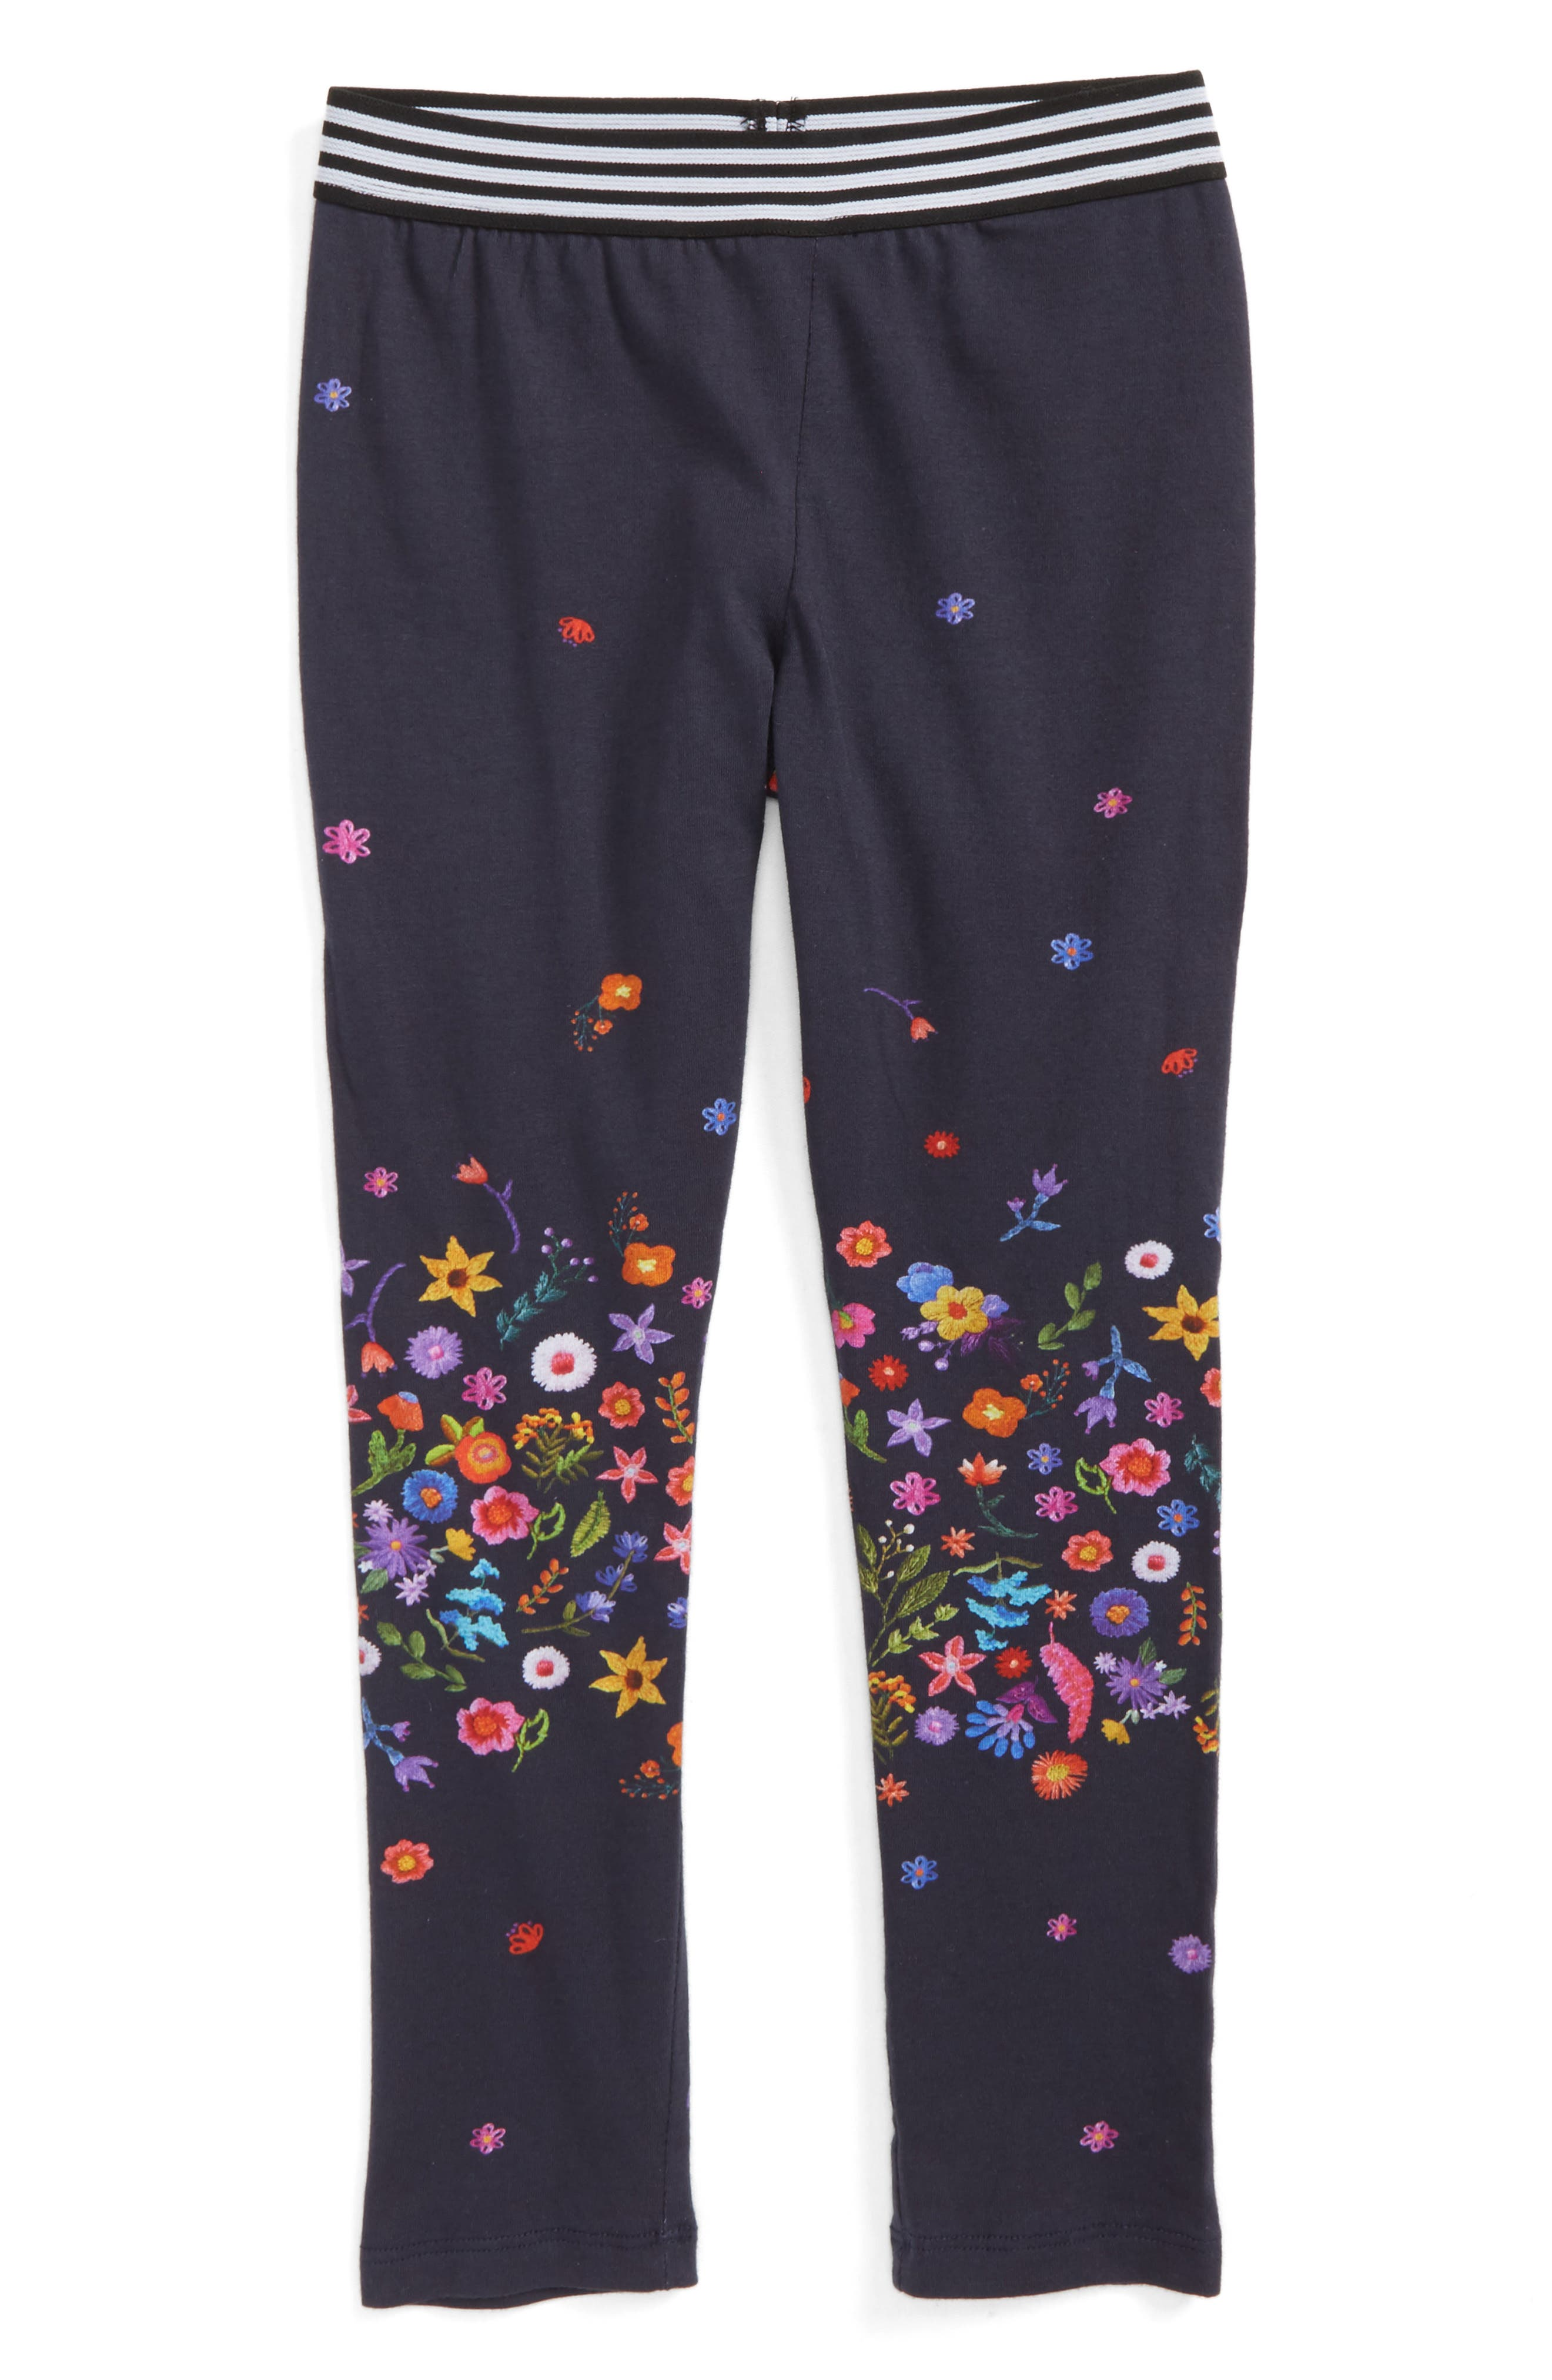 Alternate Image 1 Selected - Truly Me Floral Print Leggings (Toddler Girls & Little Girls)